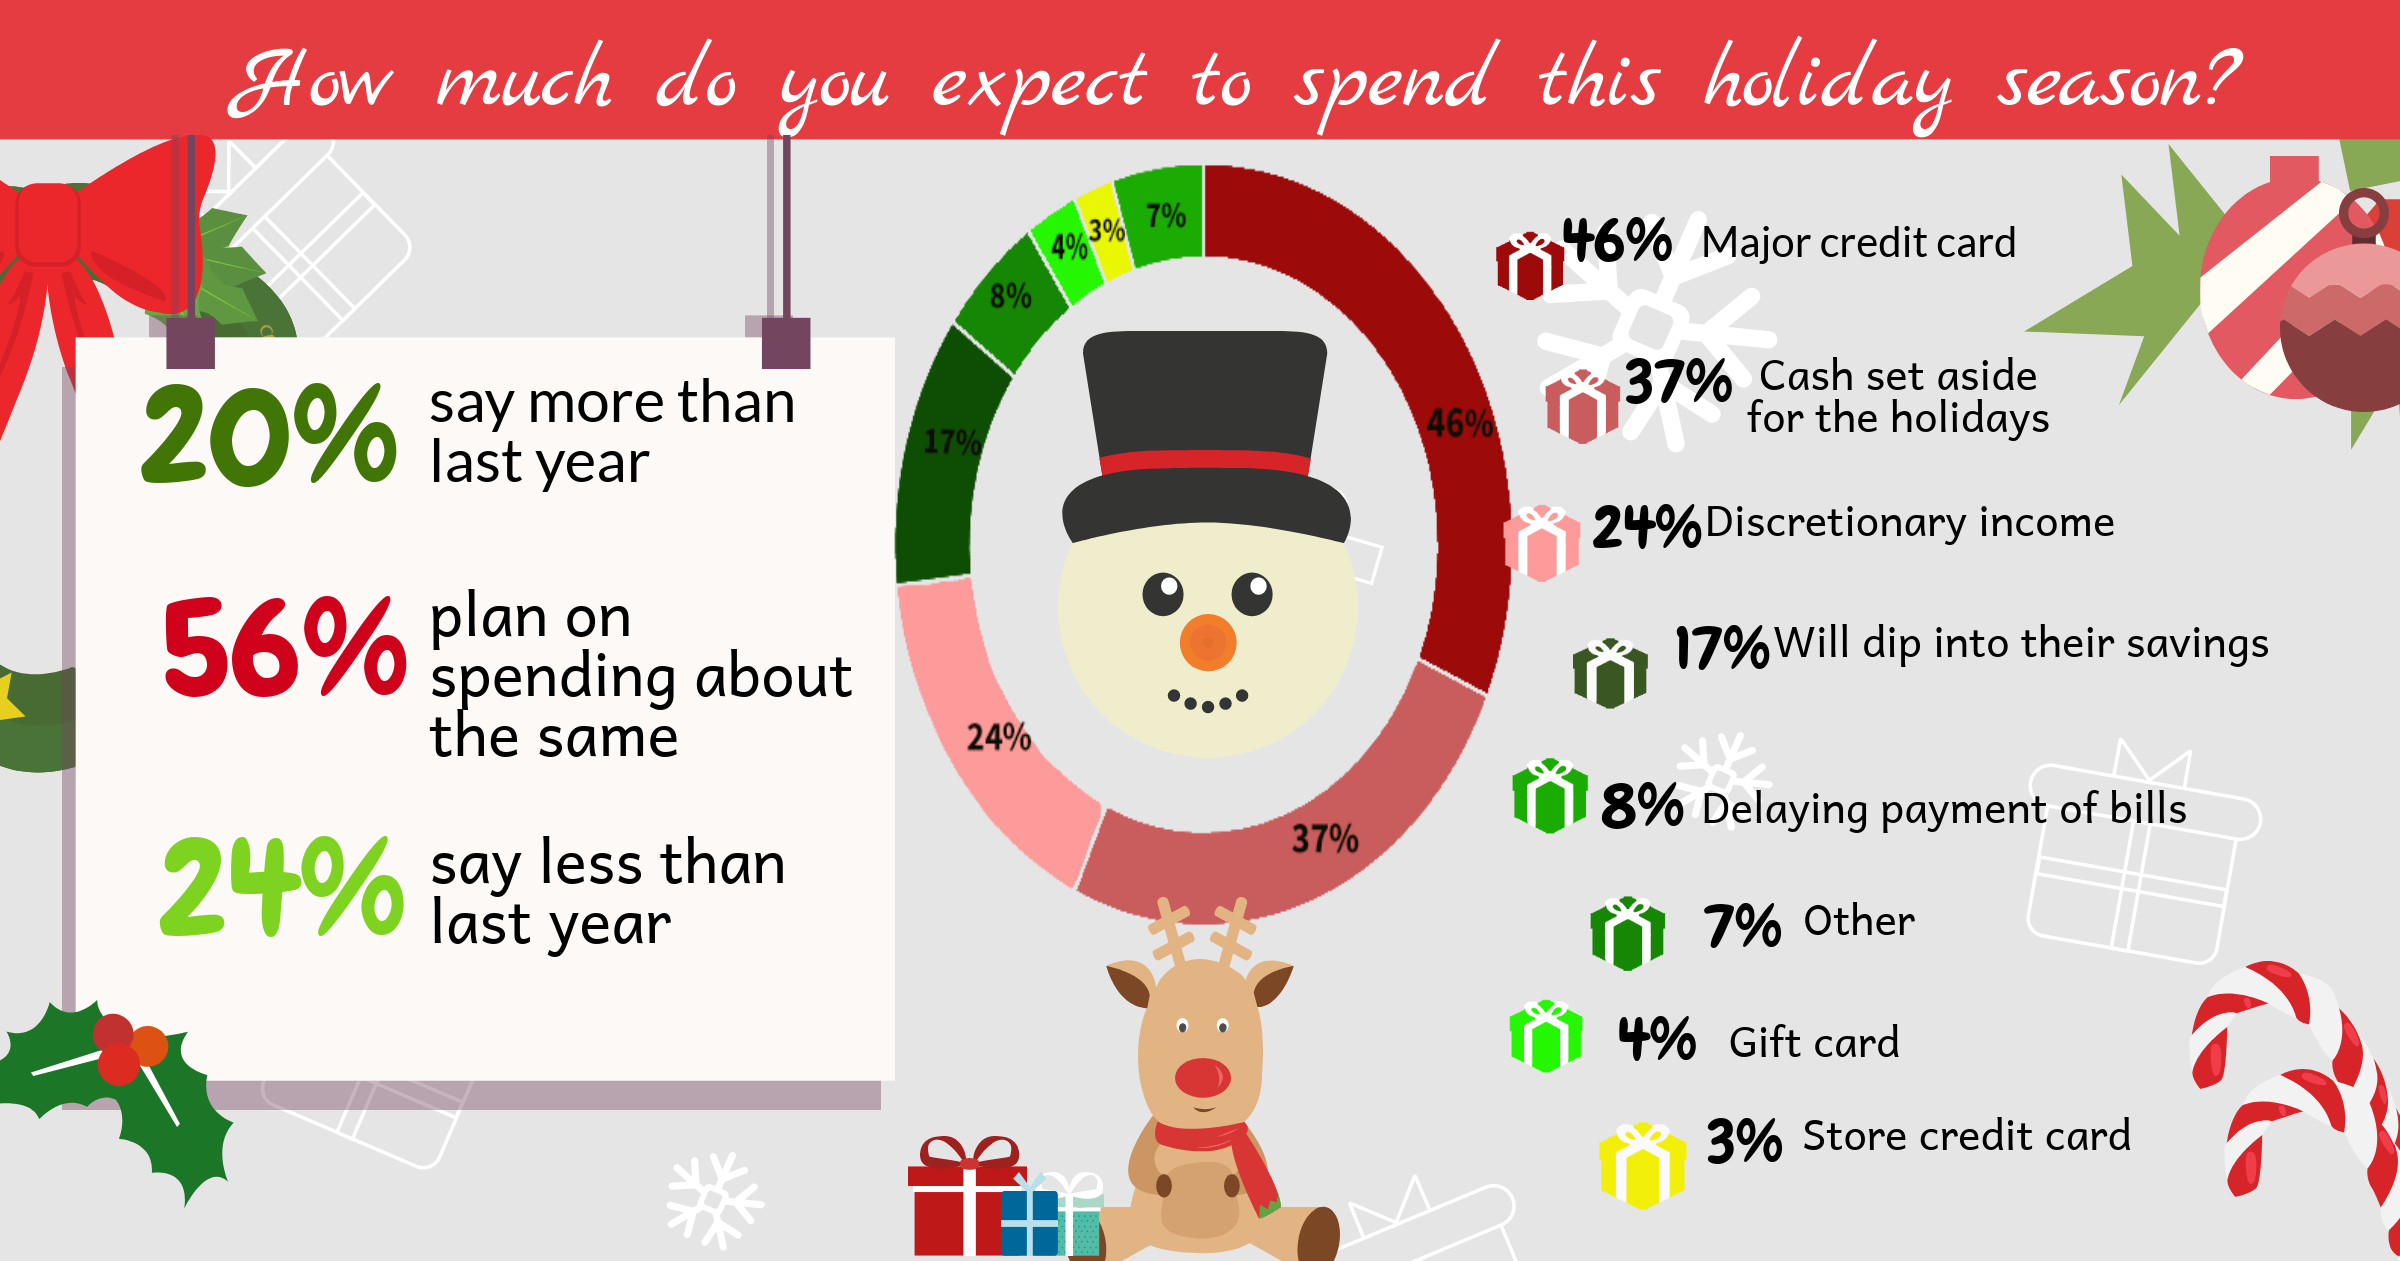 holiday shopping, insightrix, saskwatch research, shopping, christmas shopping, saskatchewan